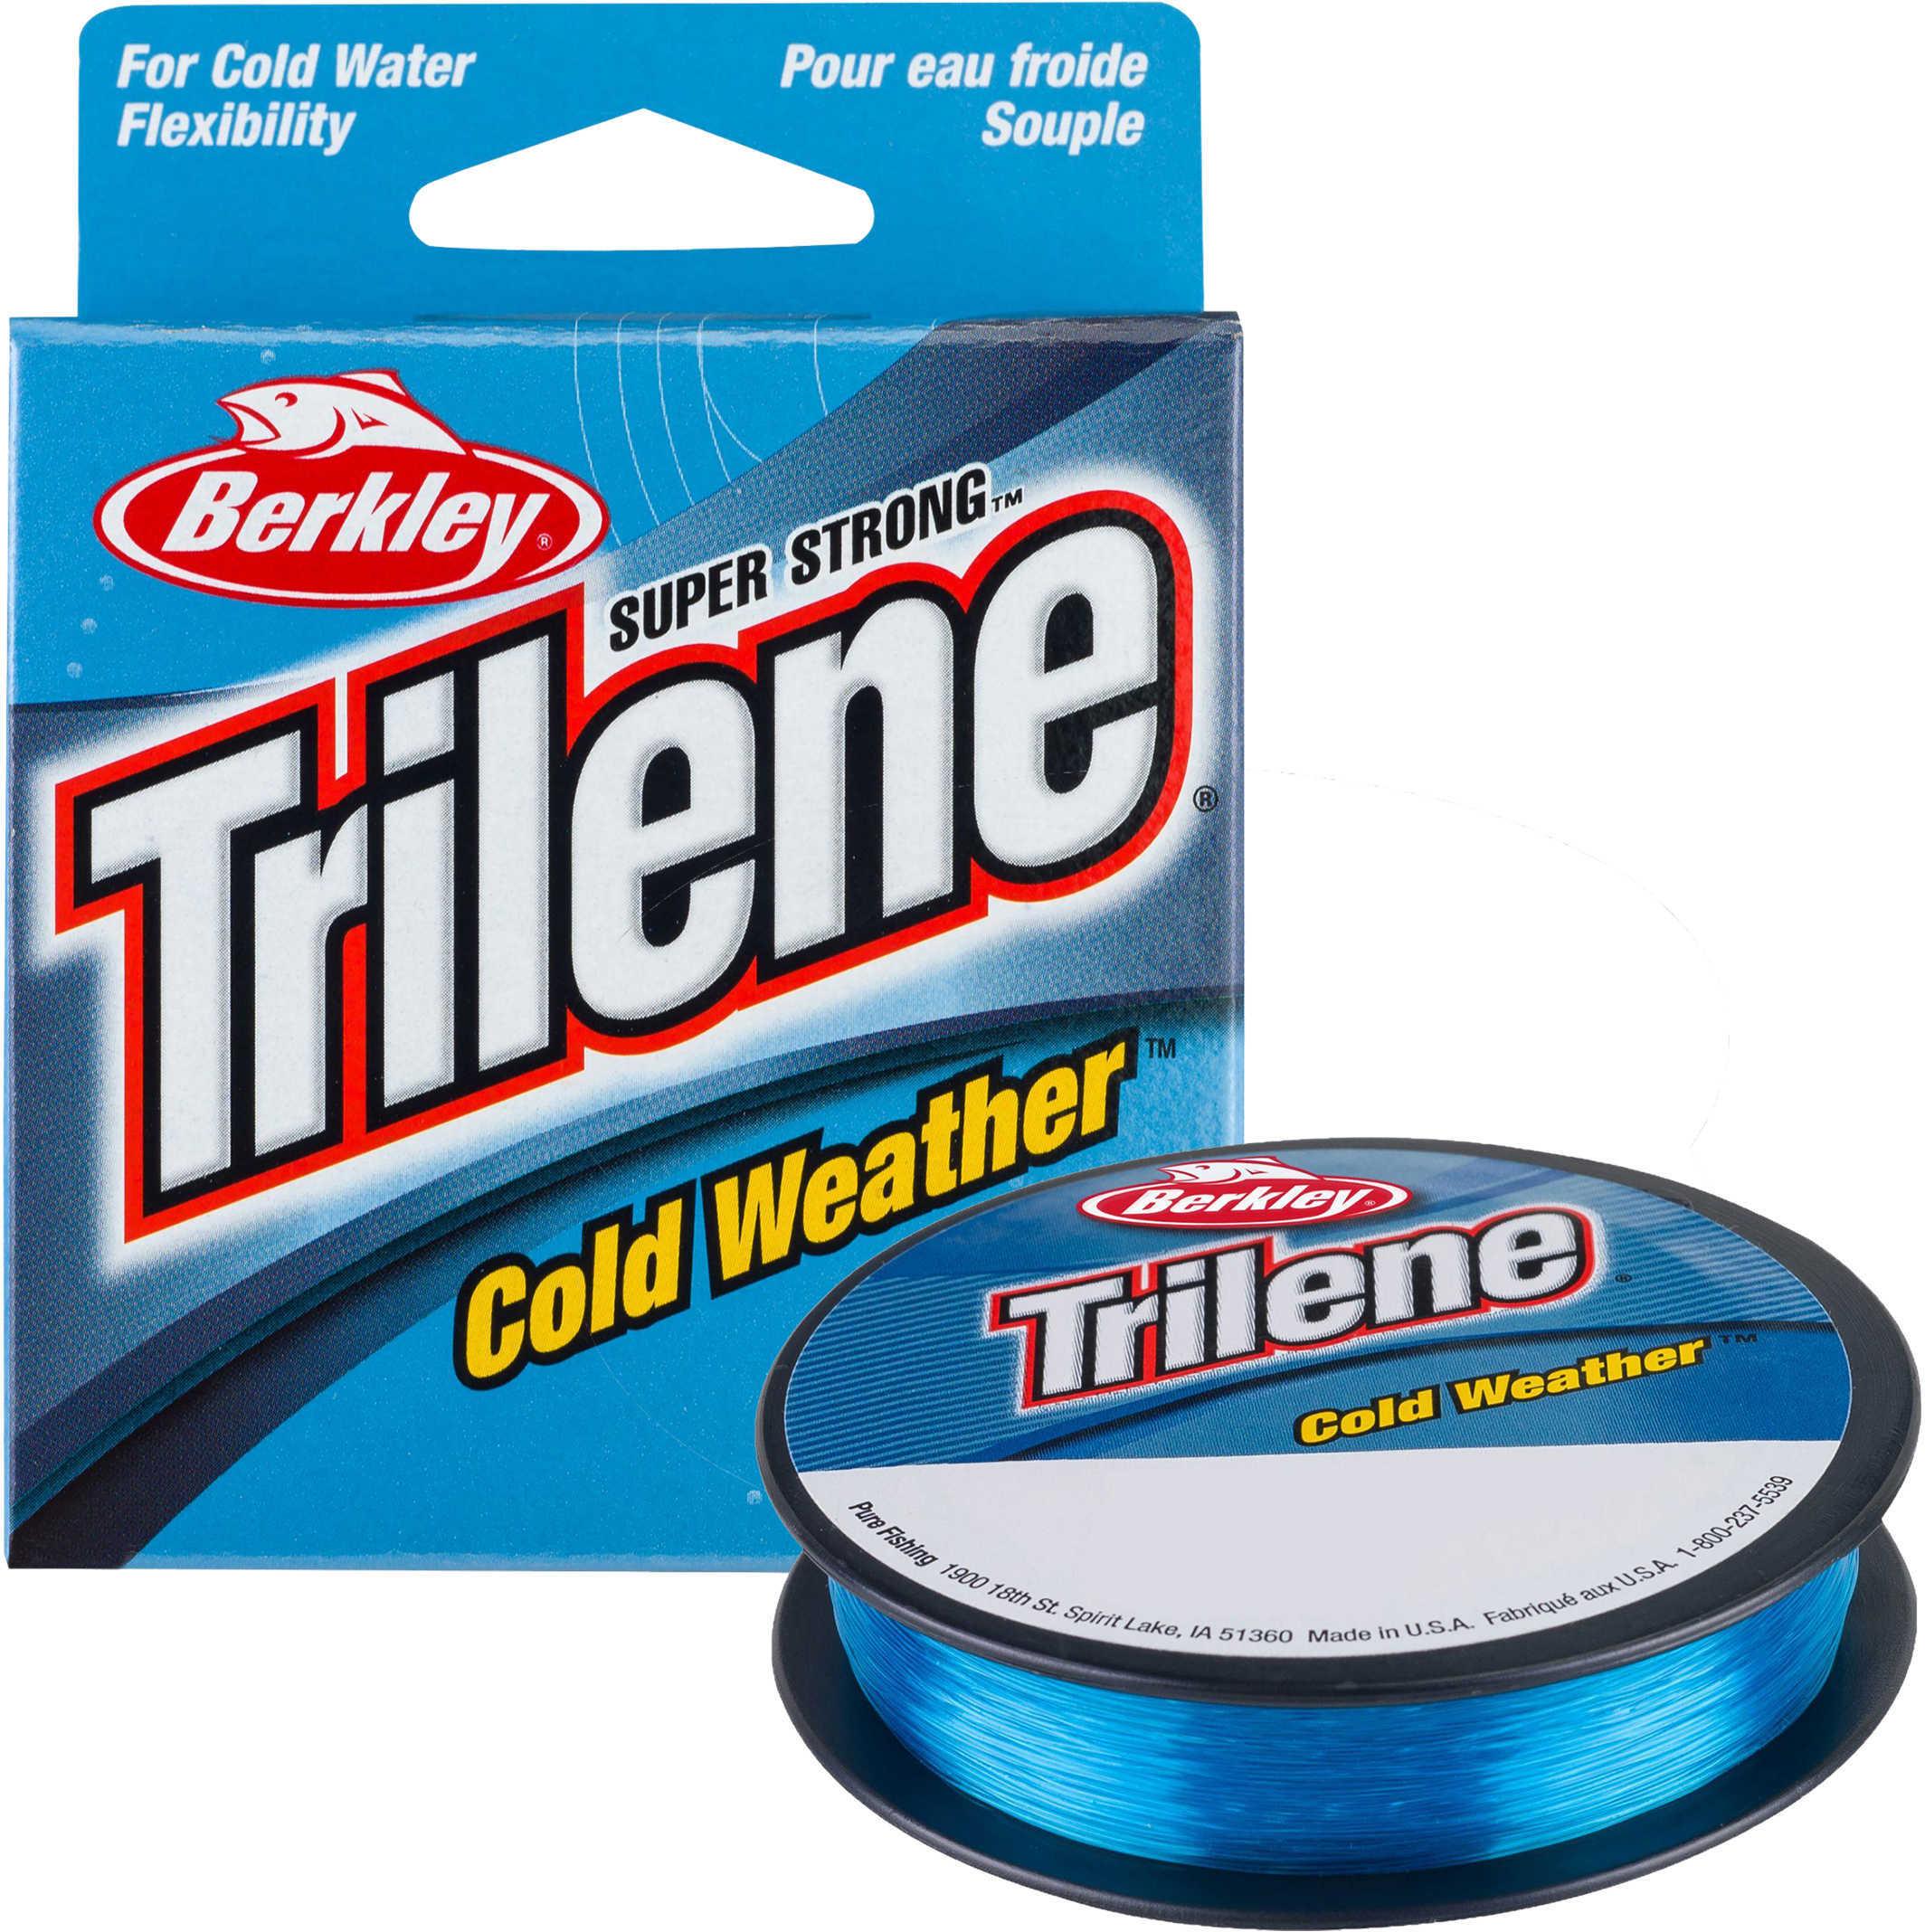 Berkley Trilene Cold Weather, 110 Yards, Electric Blue Md: 1004399